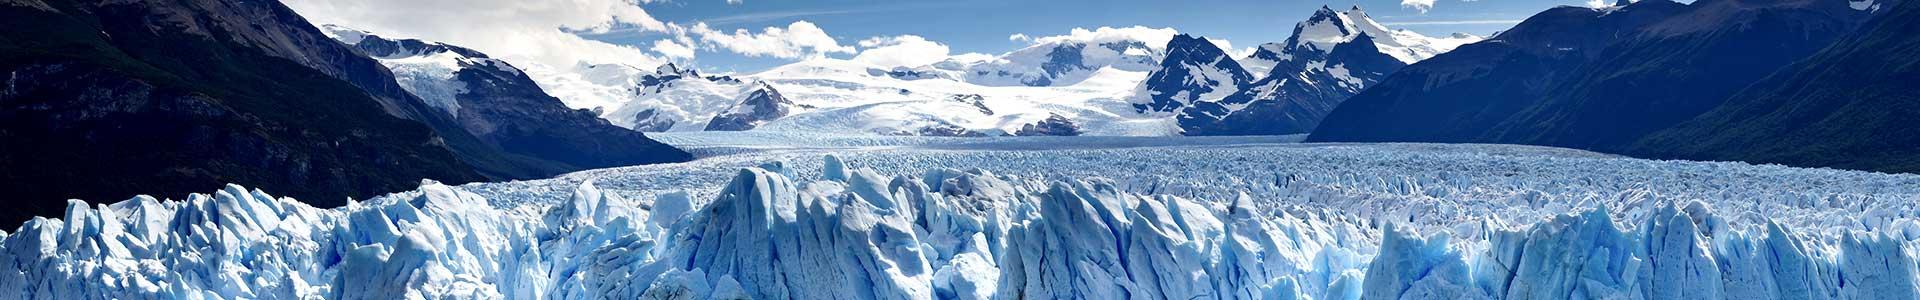 Voyage en Argentine - TUI